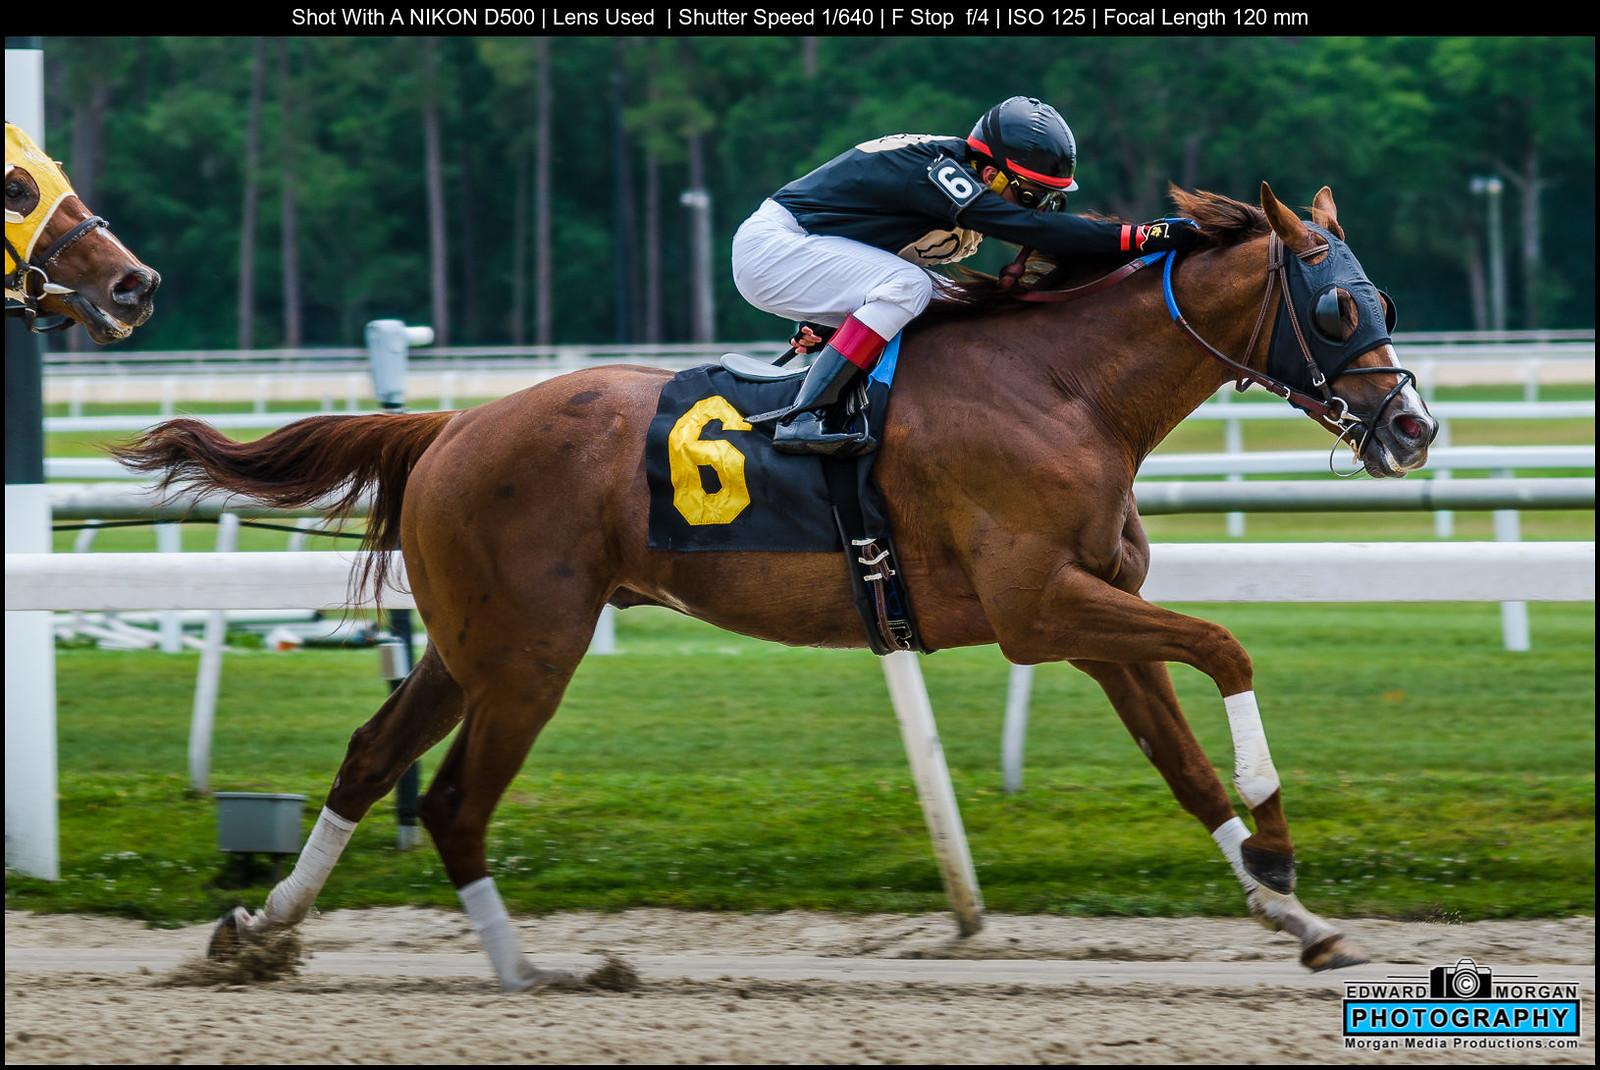 Horse-race-1546-X3